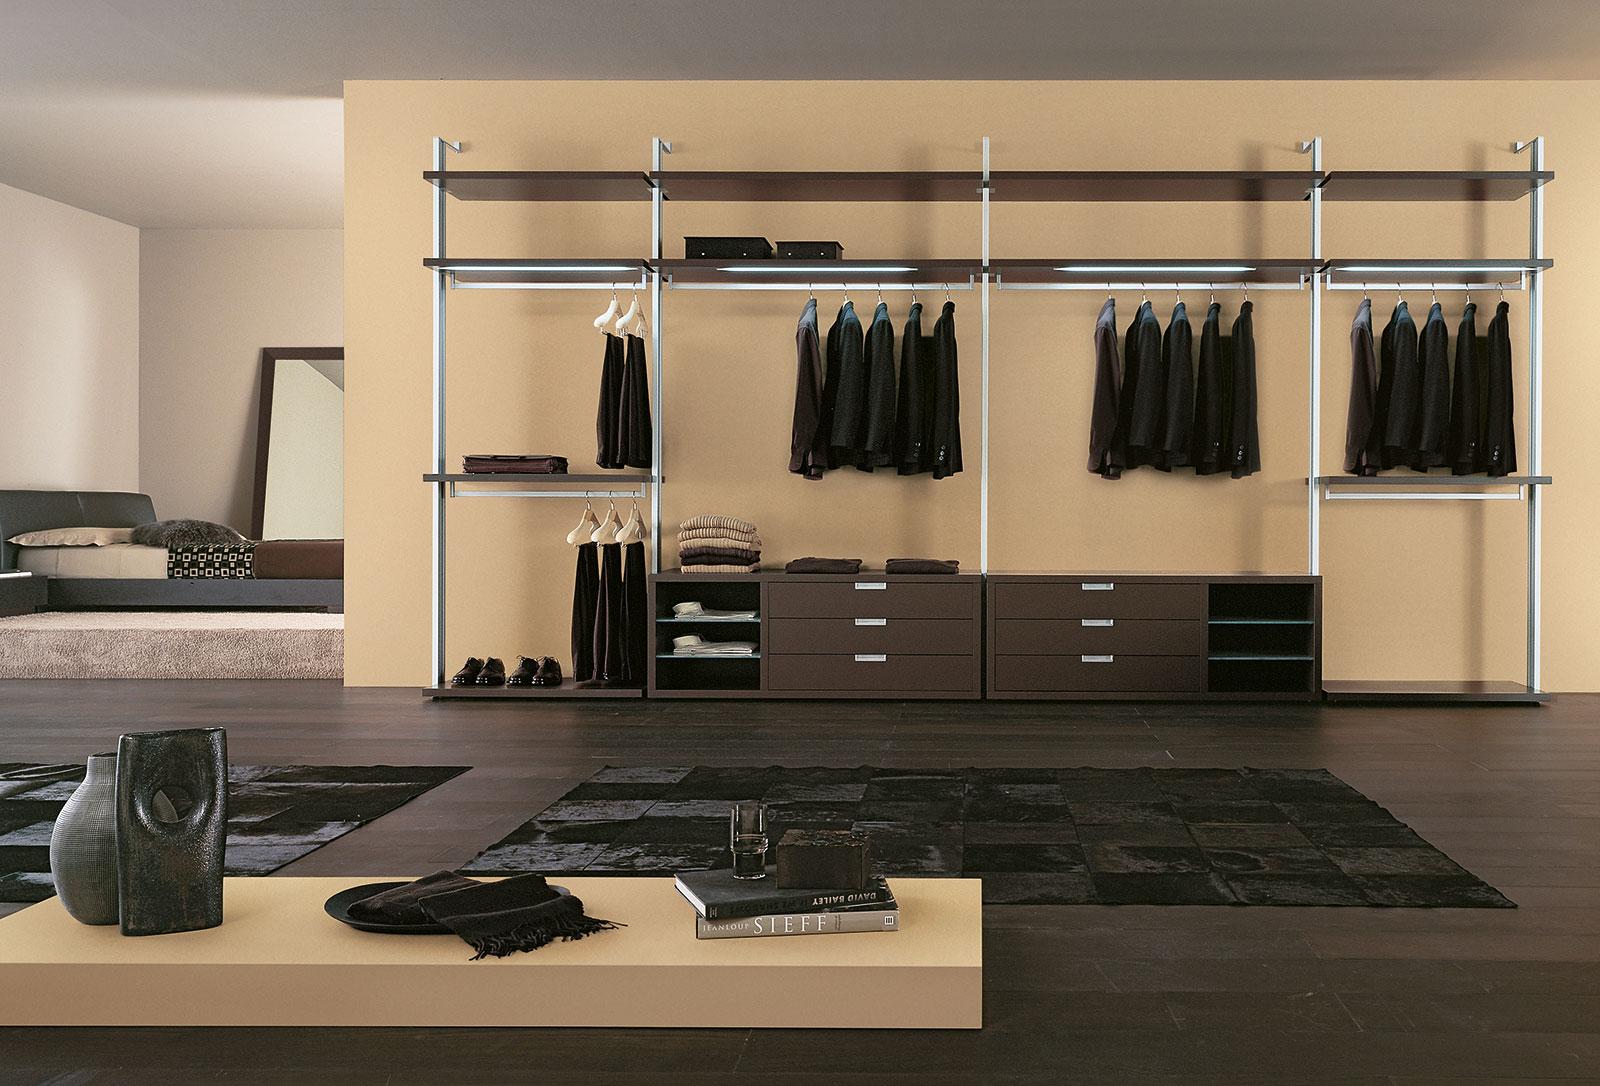 Porta Cabina Armadio Misure : Cabina armadio su misura porte sistemi henry glass